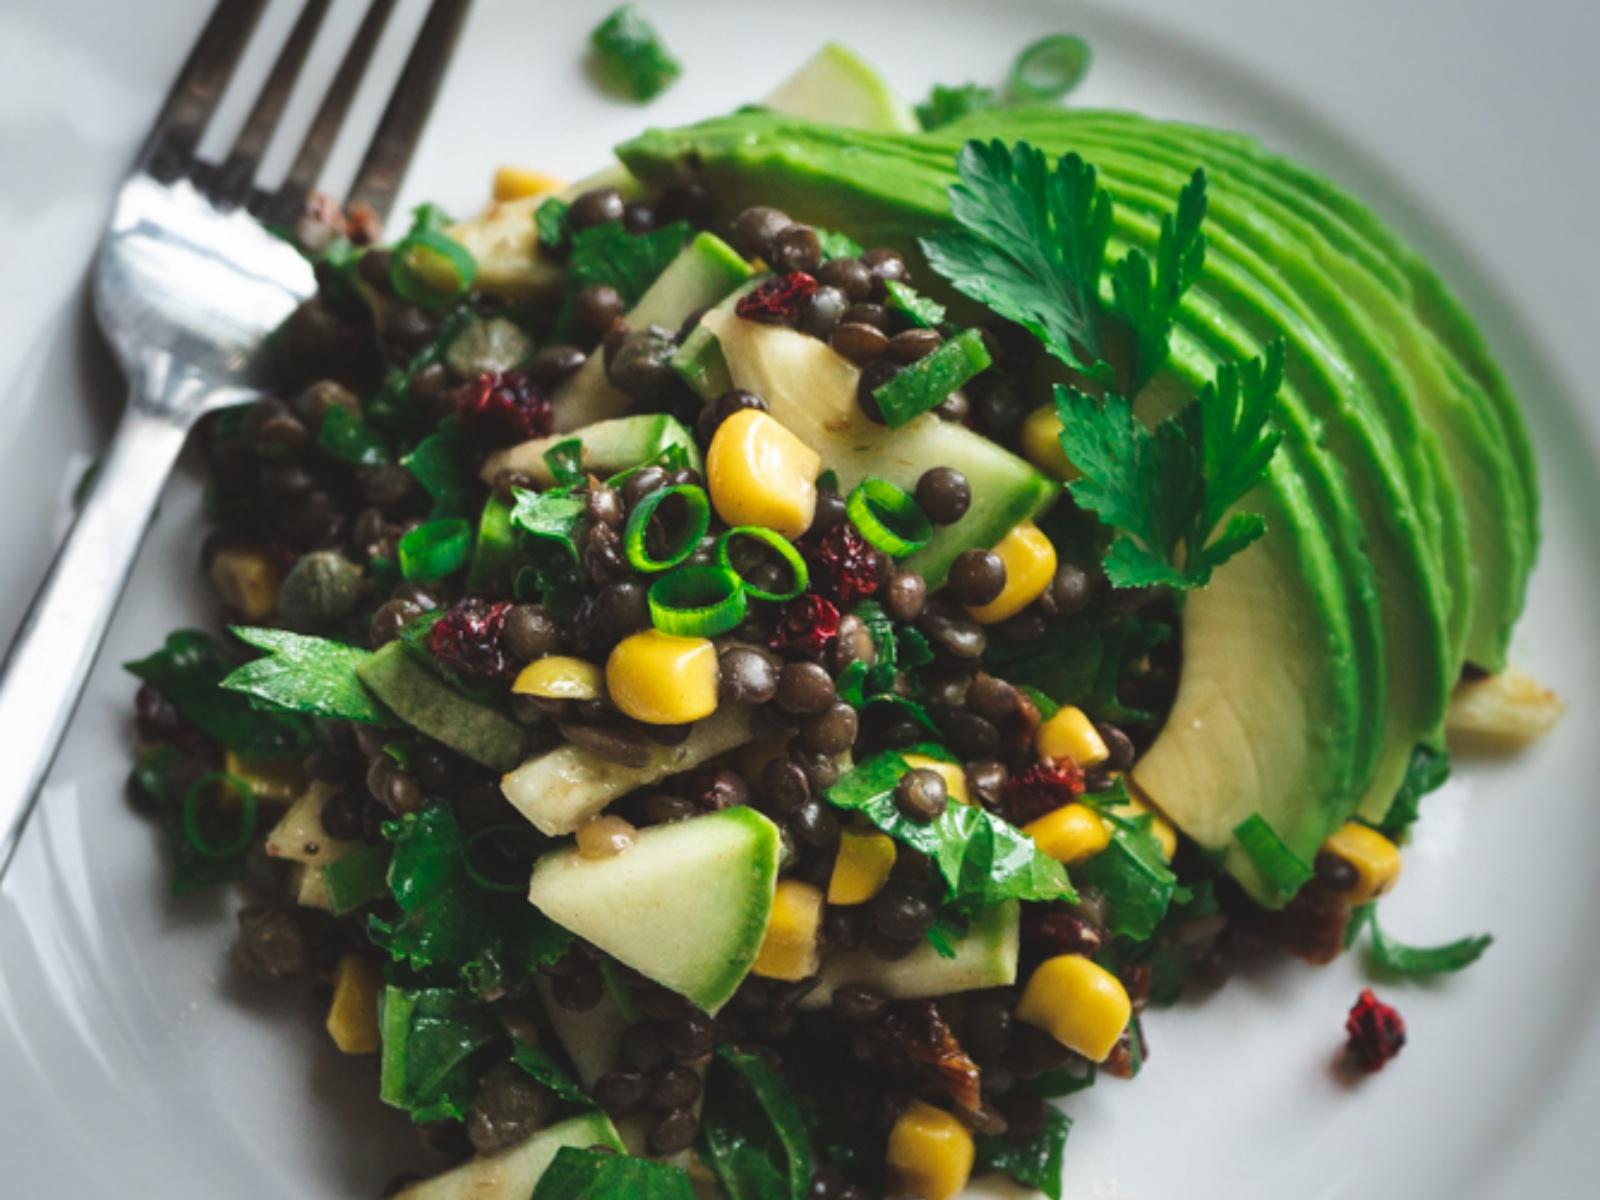 Lentil Salad with Crunchy Veggies and Herbs [Vegan]